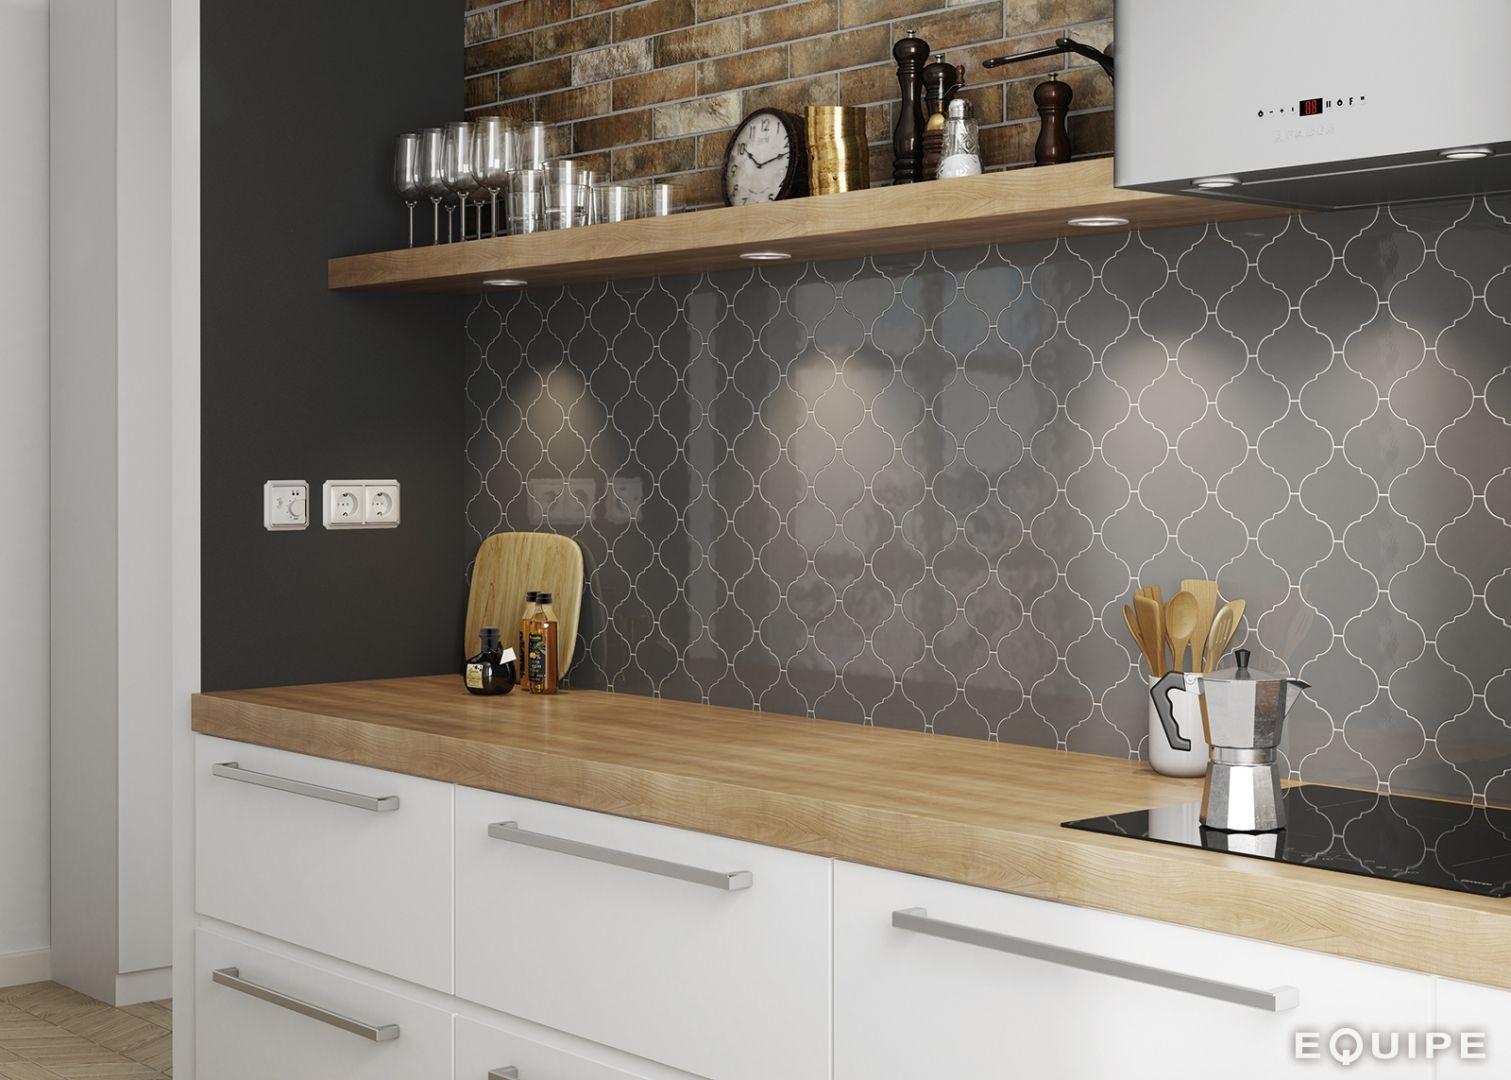 Encaustic Wall Tile Ireland Morrocan Dark Grey (With